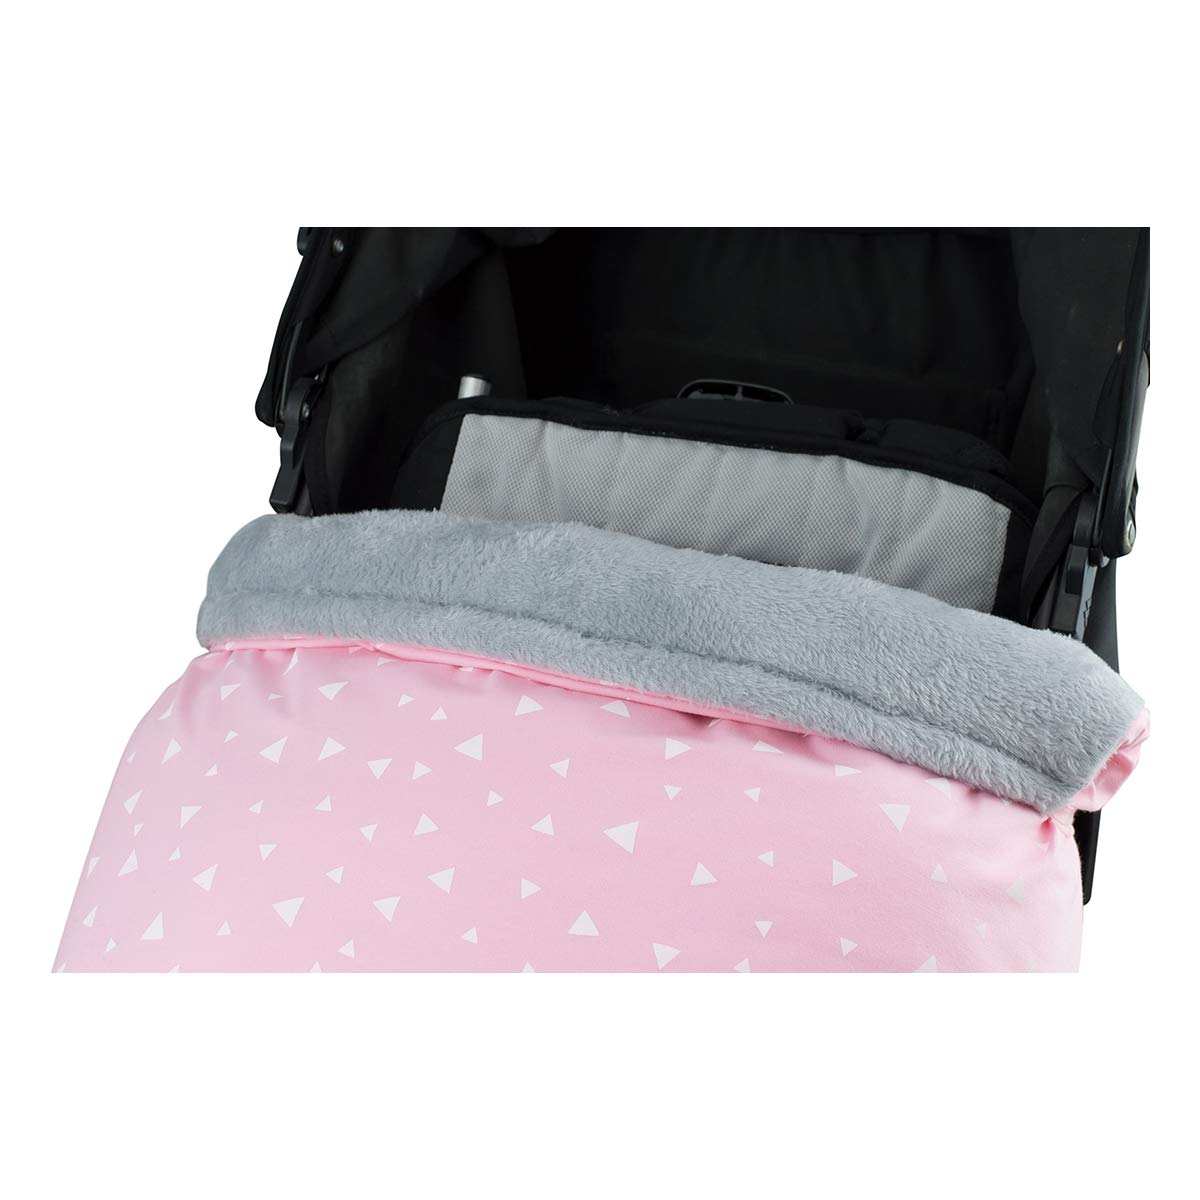 Janabeb/é Universal Winter Baby Blanket Footmuff for Pushchairs RACCOON, POLAR FLEECE